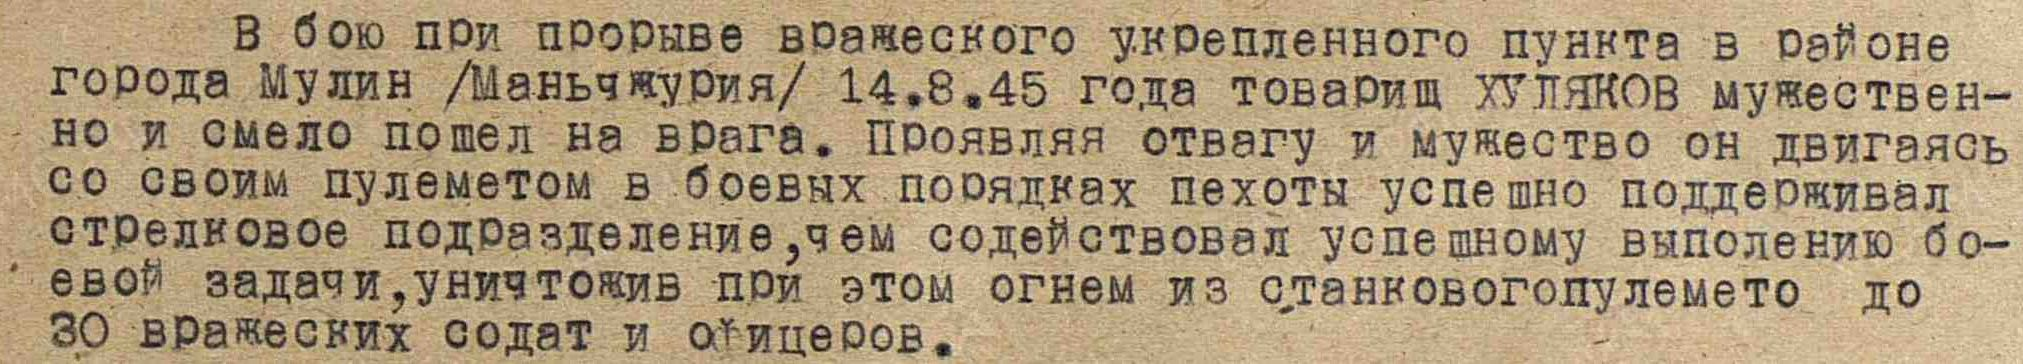 opisanei-podviga-ivana-hudyakov-min